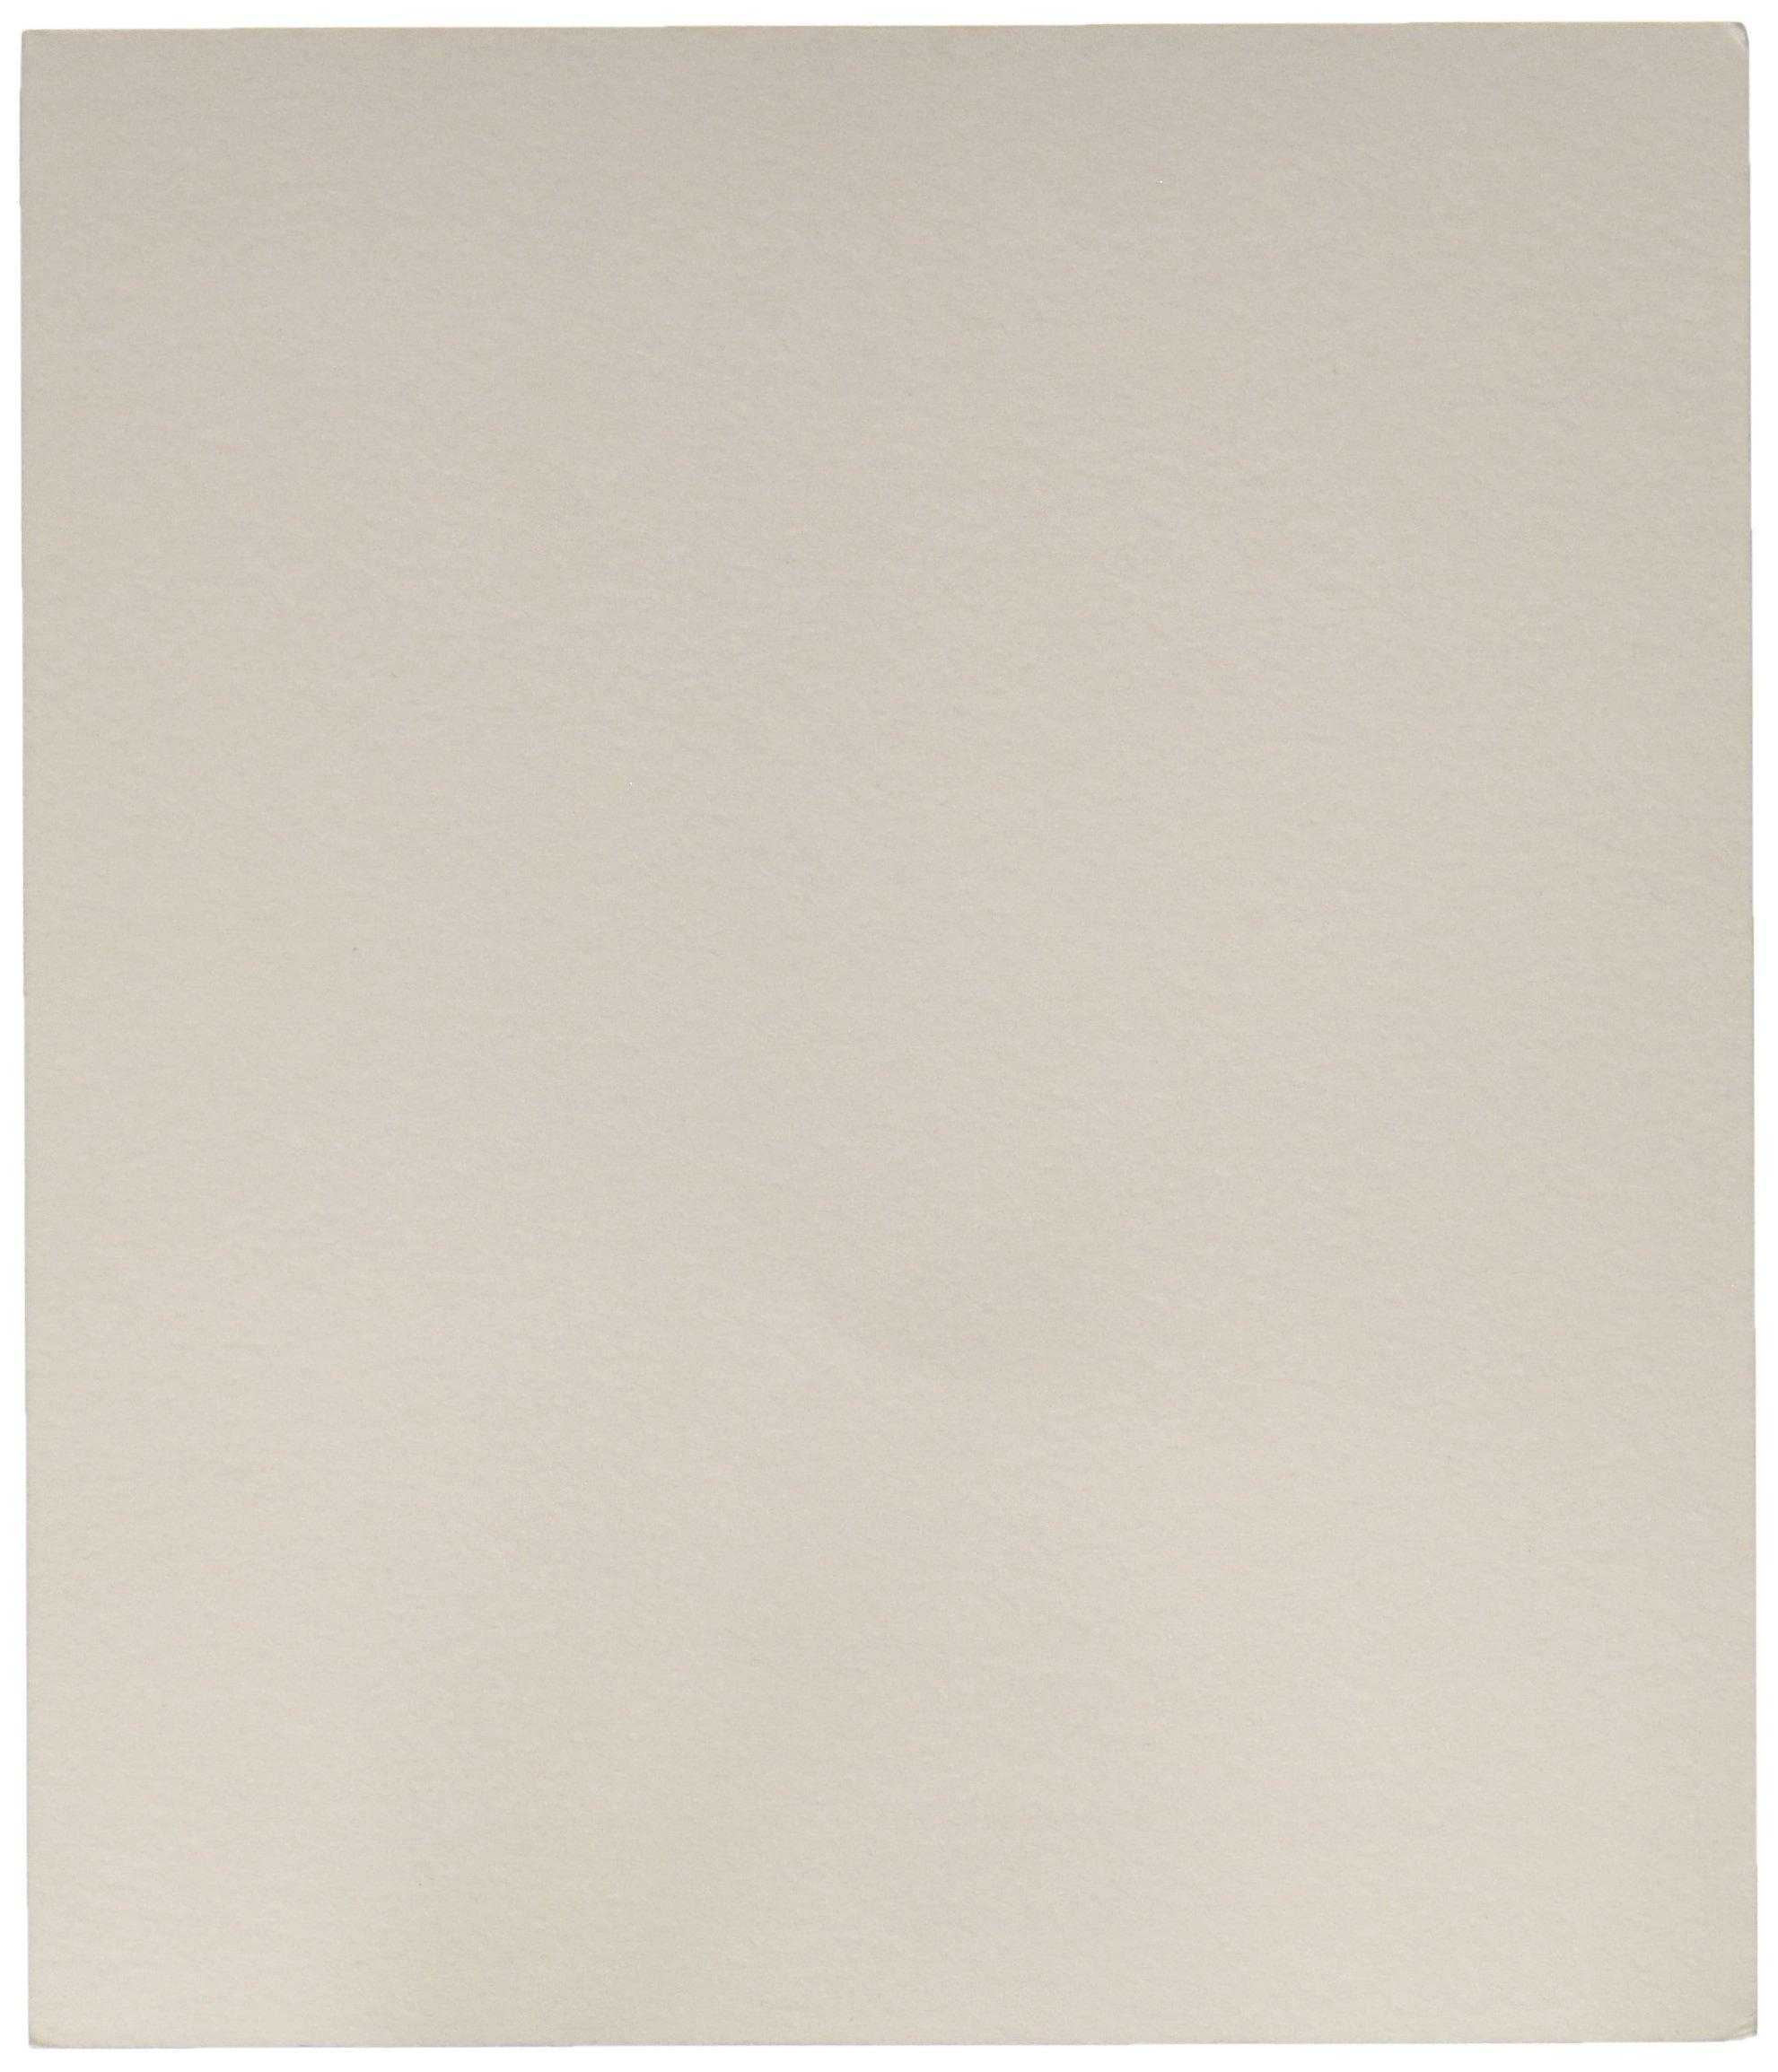 GE Whatman 3030-6132 Cellulose Chromatography Paper Sheet, 14cm Length x 12cm Width, 29psi Dry Burst, 130mm/30min Flow Rate, Grade 3MM (Pack of 100)